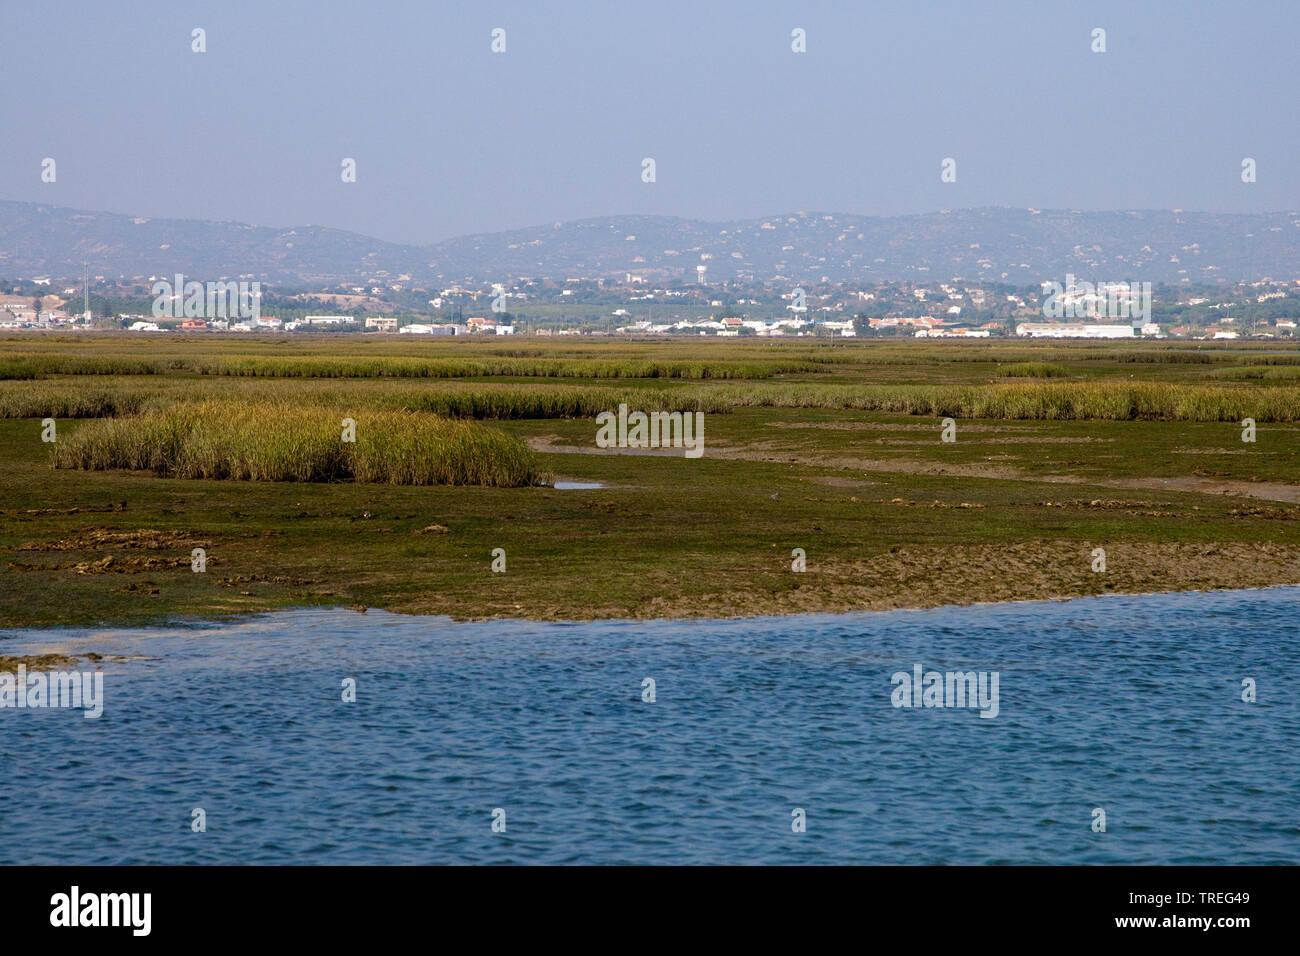 Ria Formosa Lagune, Portugal, Parque Natural da Ria Formosa   Ria Formosa lagoon, Portugal, Parque Natural da Ria Formosa   BLWS525785.jpg [ (c) blick - Stock Image